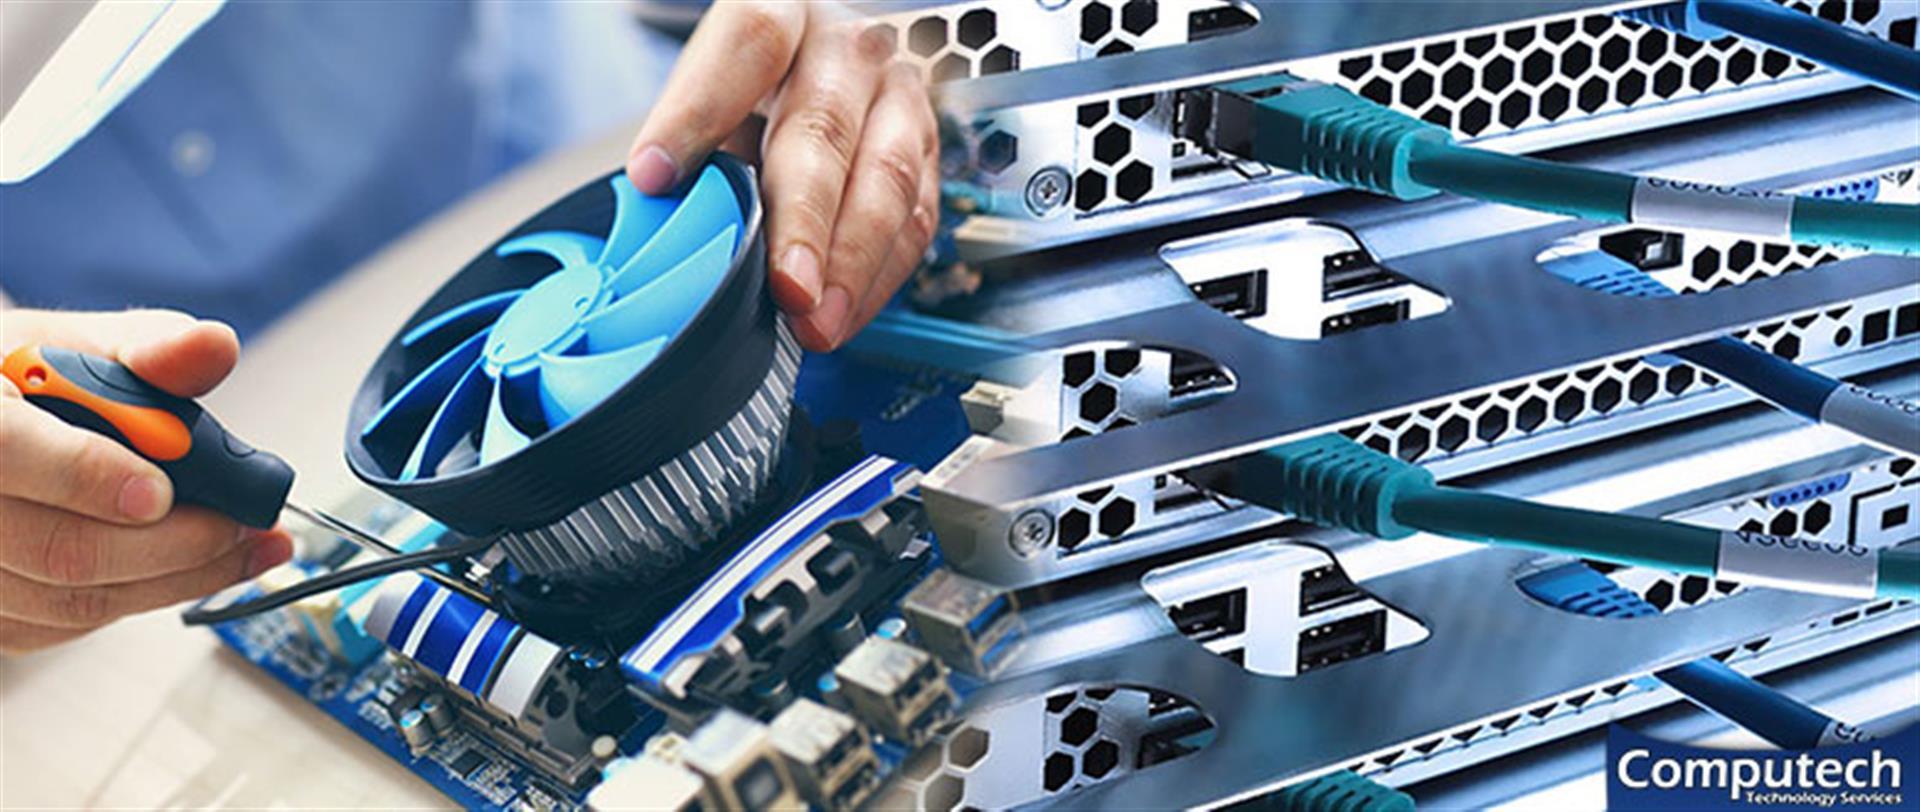 Savannah Georgia On Site PC & Printer Repairs, Network, Voice & Data Cabling Contractors